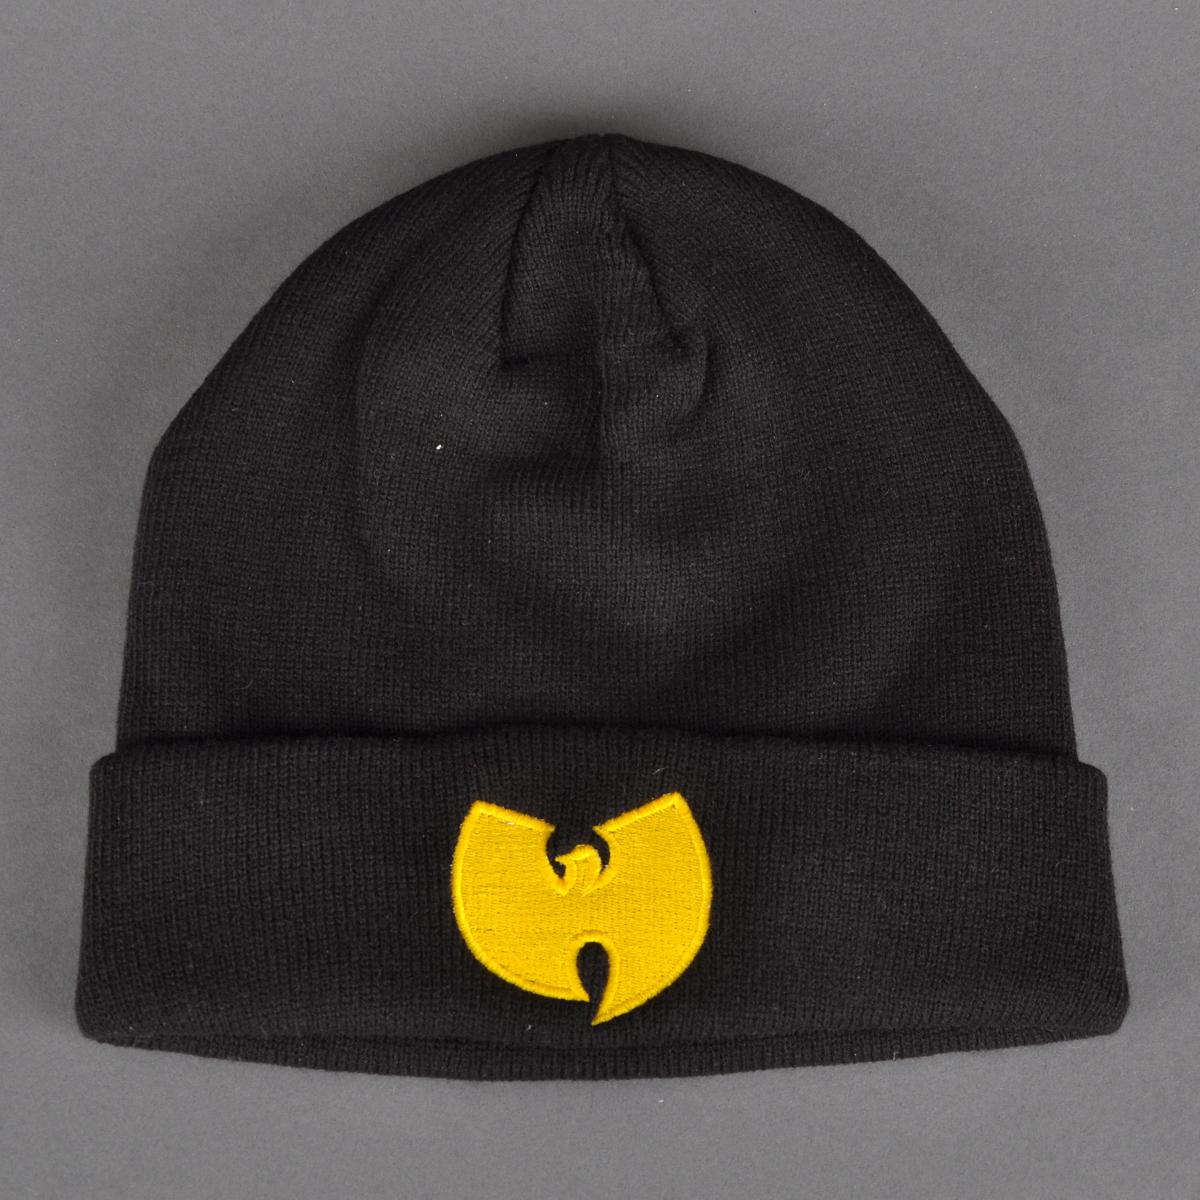 Wu-Tang beanie black / yellow   Beyond